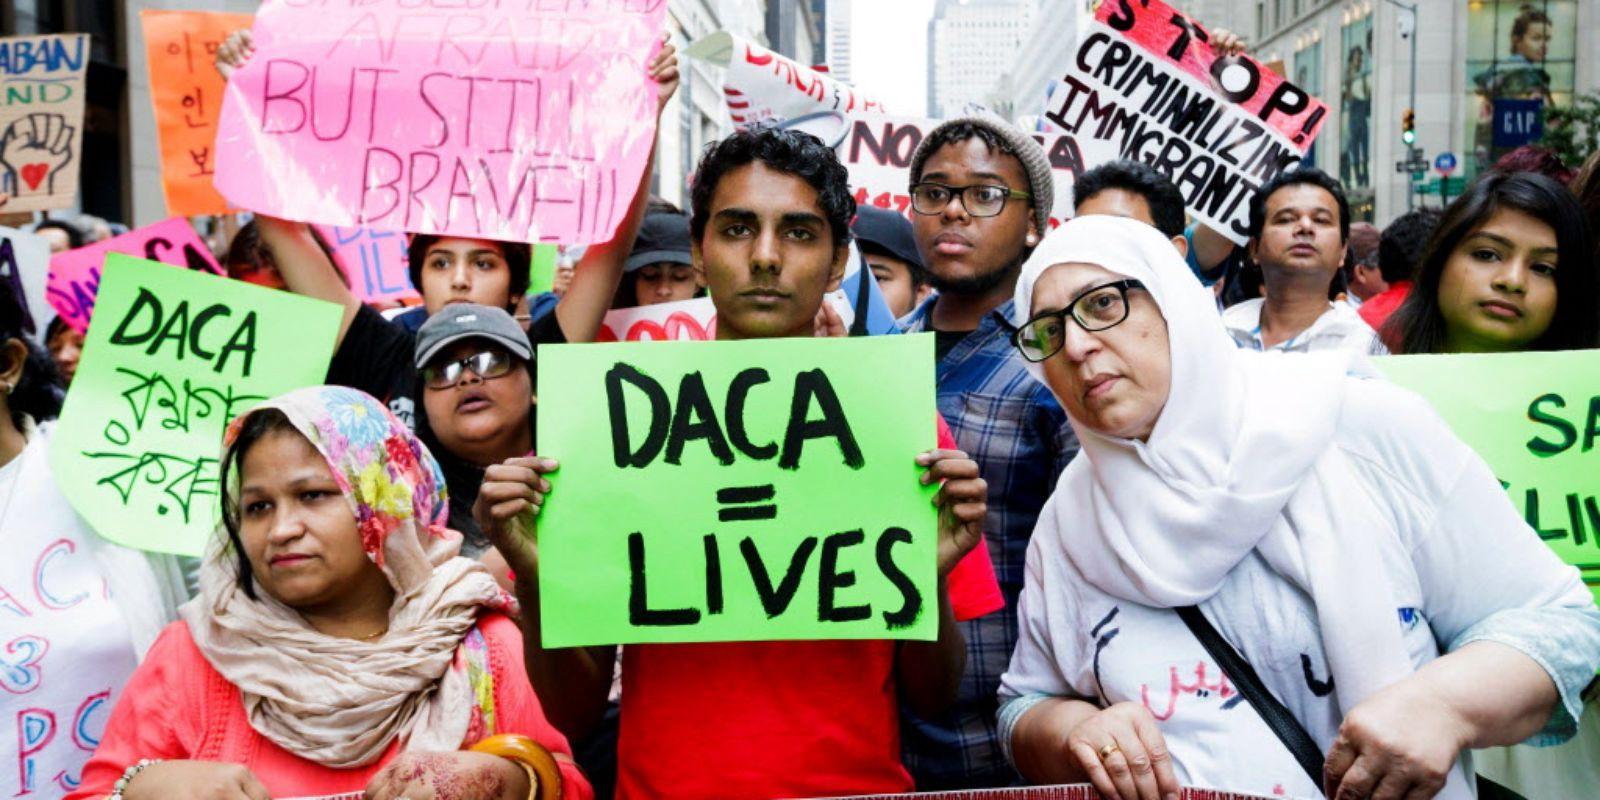 ICE v. Ohio, The United Nations v. The United States, & DACA Lives!